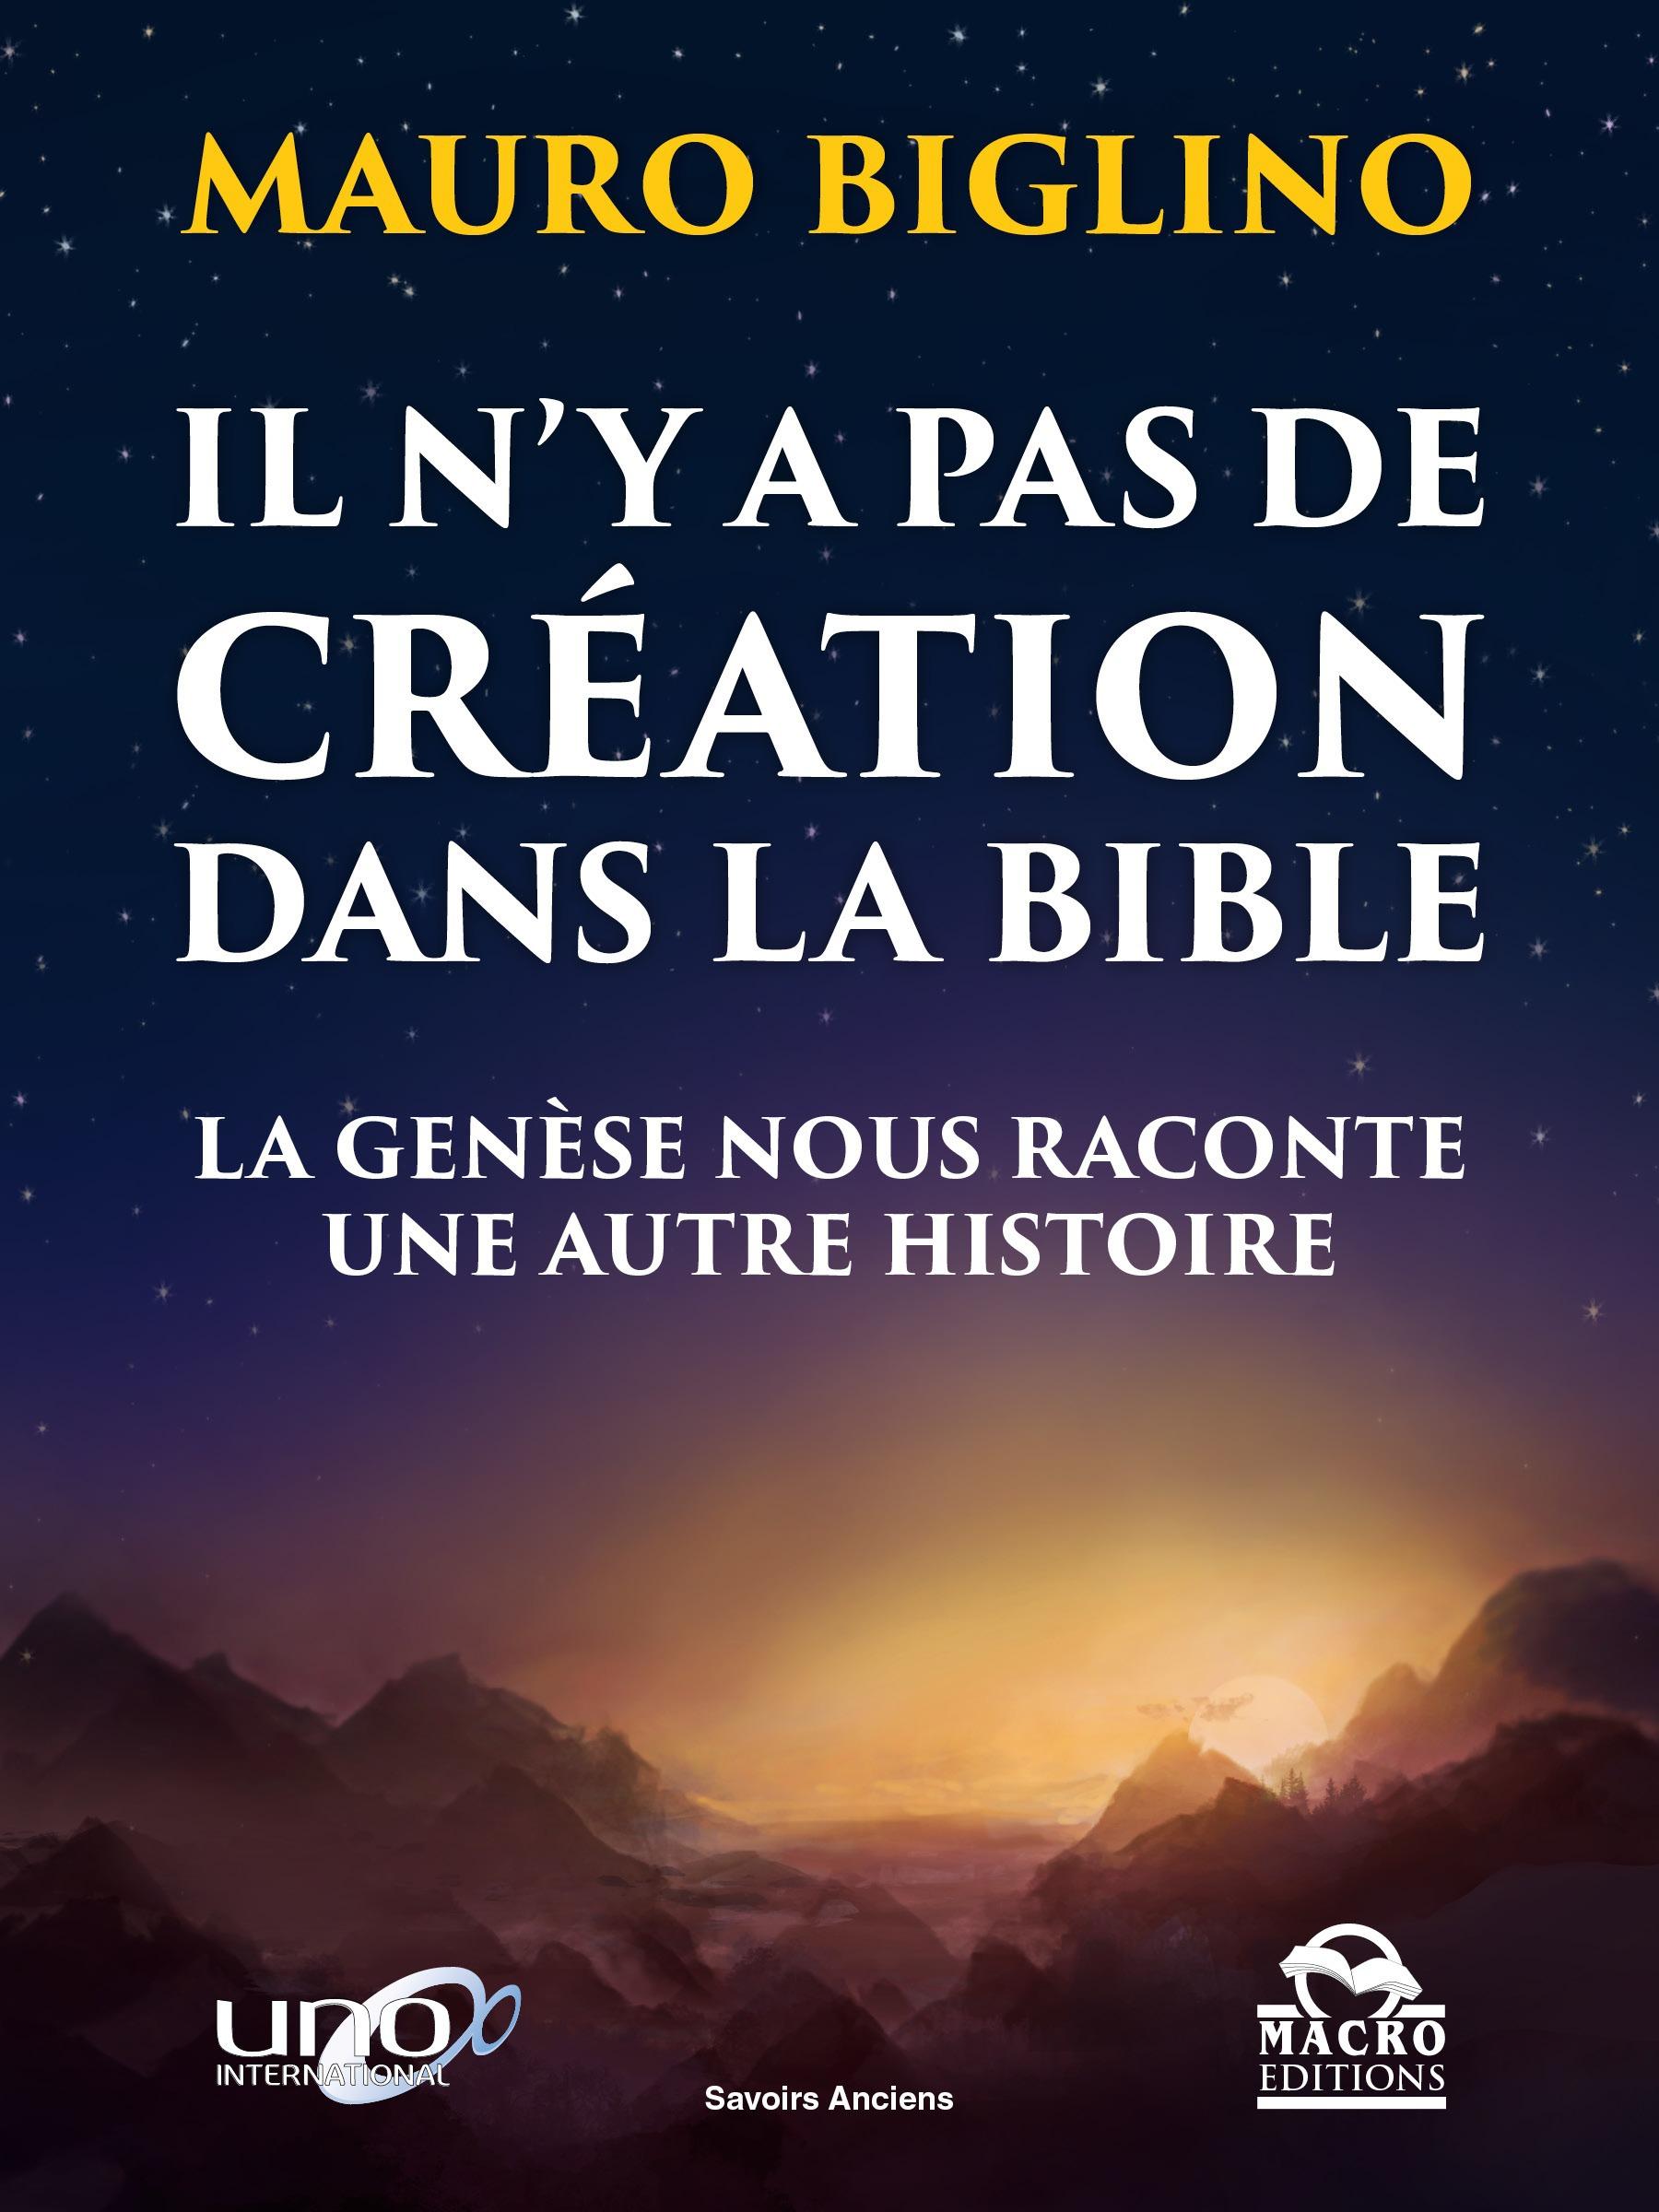 Mauro Biglino Il n'y a pas de création dans la Bible - erreur isbn